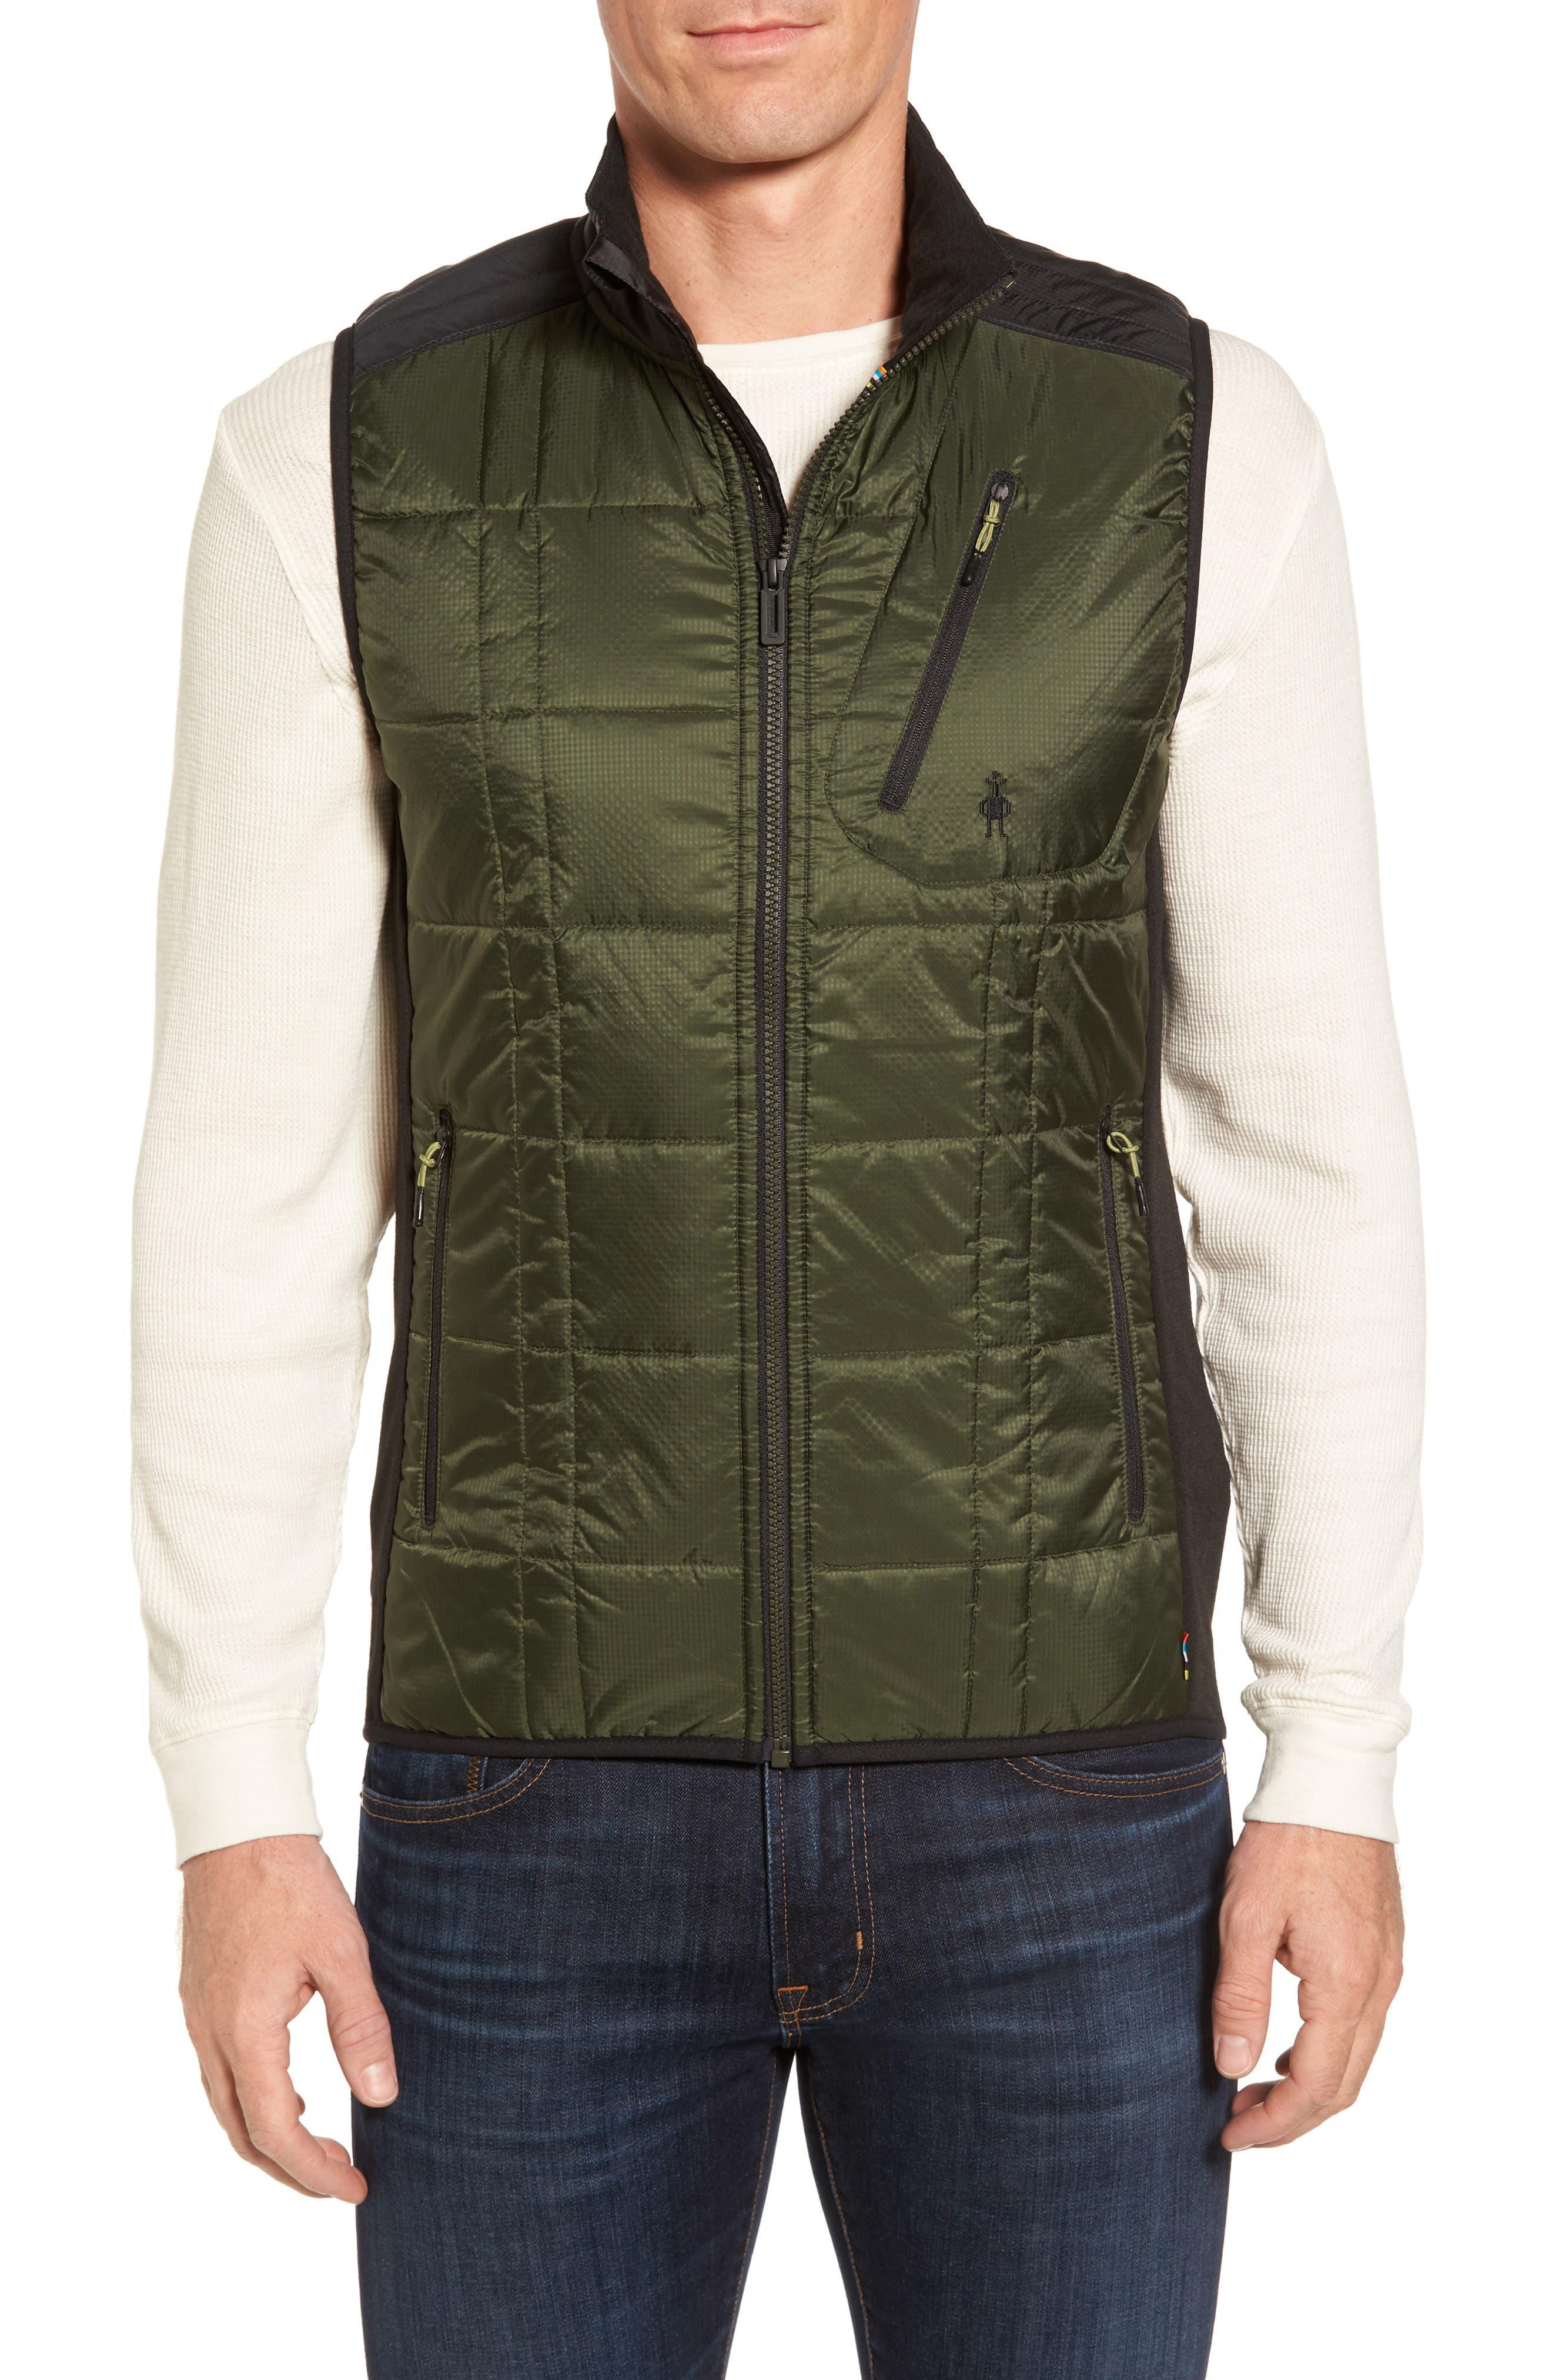 Alternate Image 1 Selected - Smartwool 'Corbet 120' Quilted Zip Front Vest